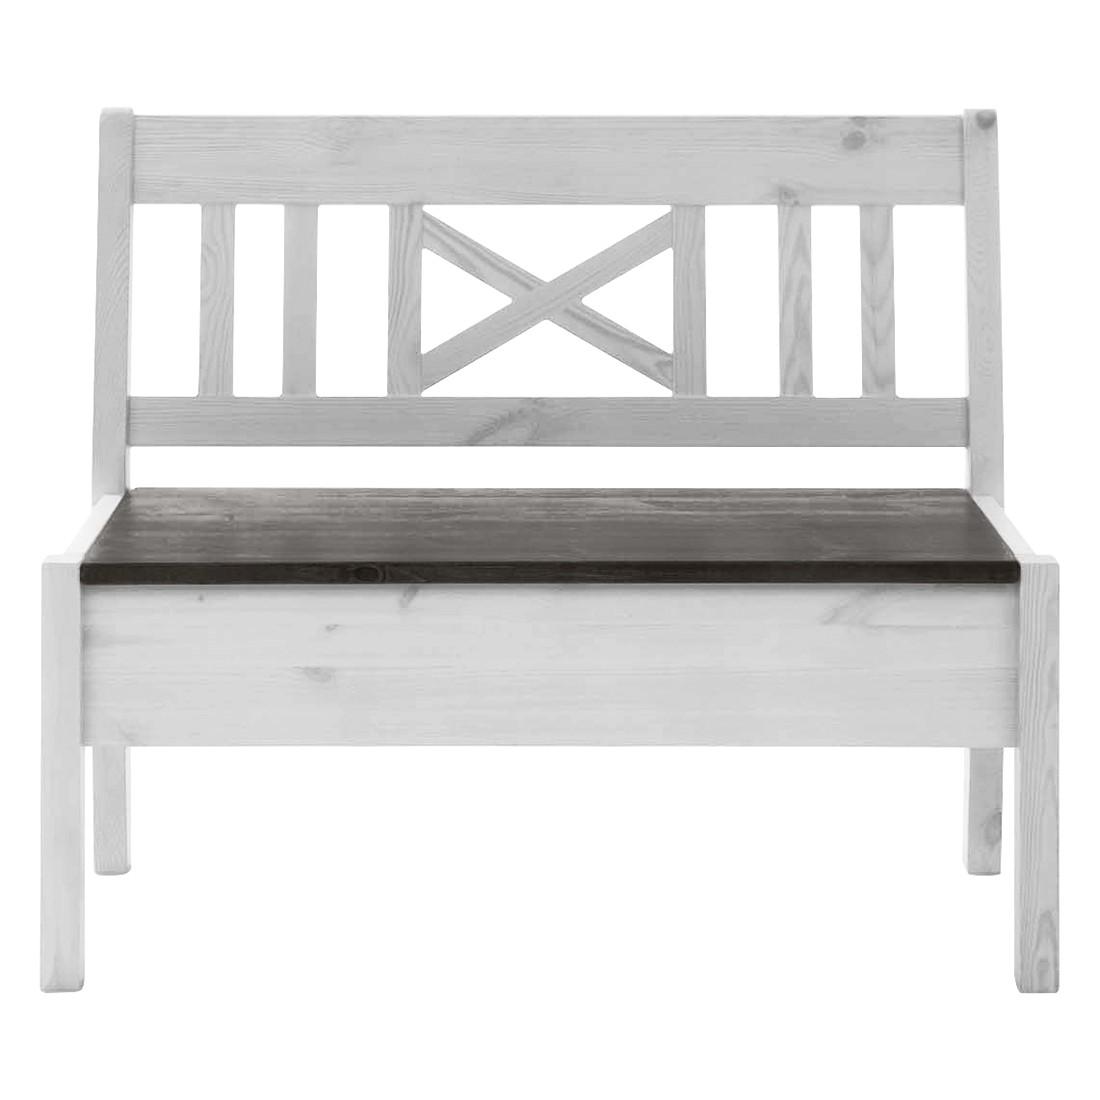 Sitzbank Fjord I – Kiefer massiv – Kiefer Weiß / Kiefer Grau – 97 cm, Landhaus Classic jetzt bestellen